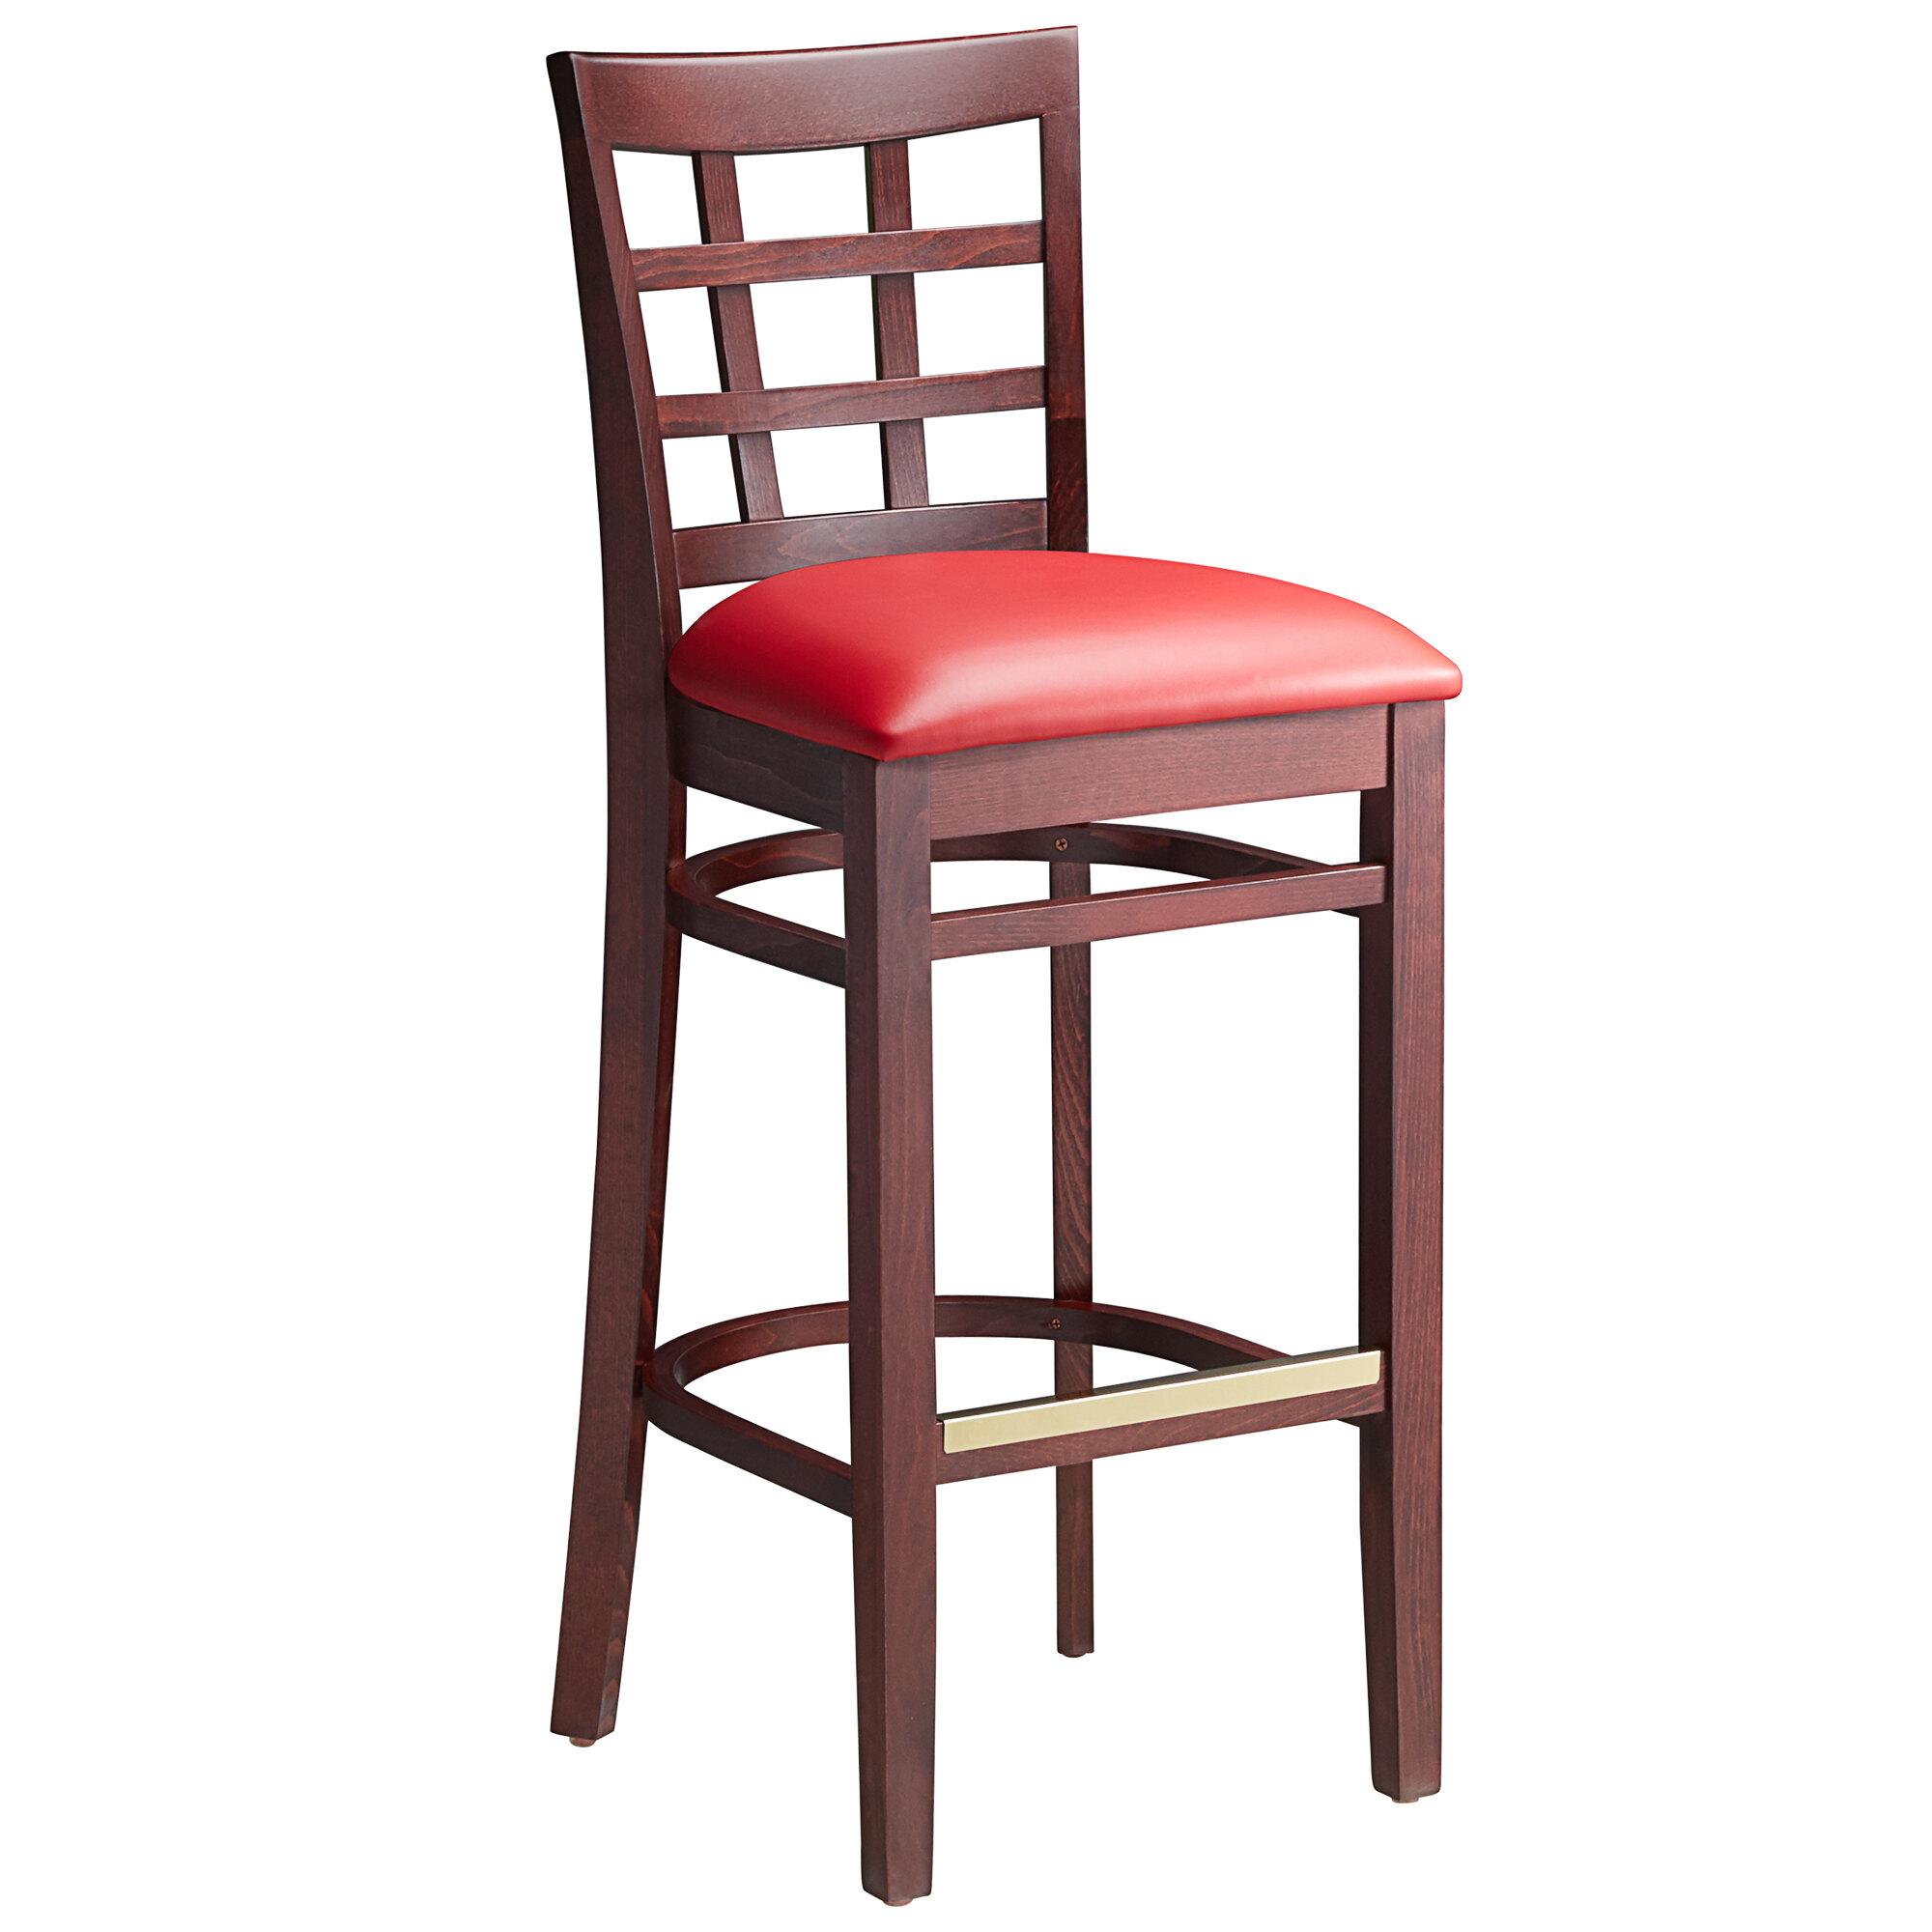 #101 - Mahogany Wood Finished Window Back Restaurant Barstool with Red Vinyl Seat